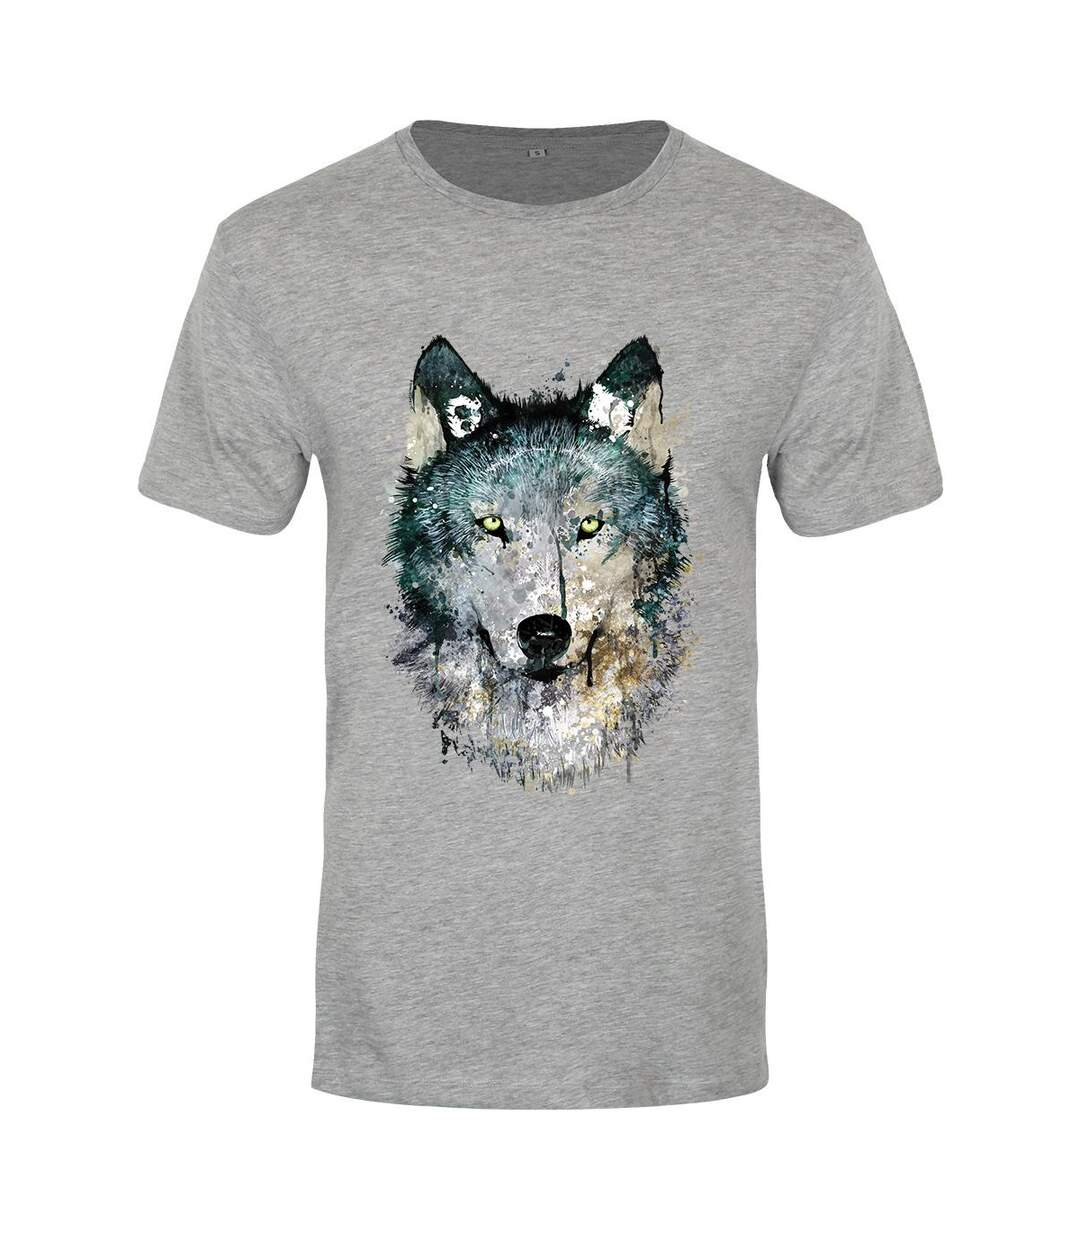 Unorthodox Collective Mens Alpha Premium Heather T-Shirt (Grey) - UTGR107